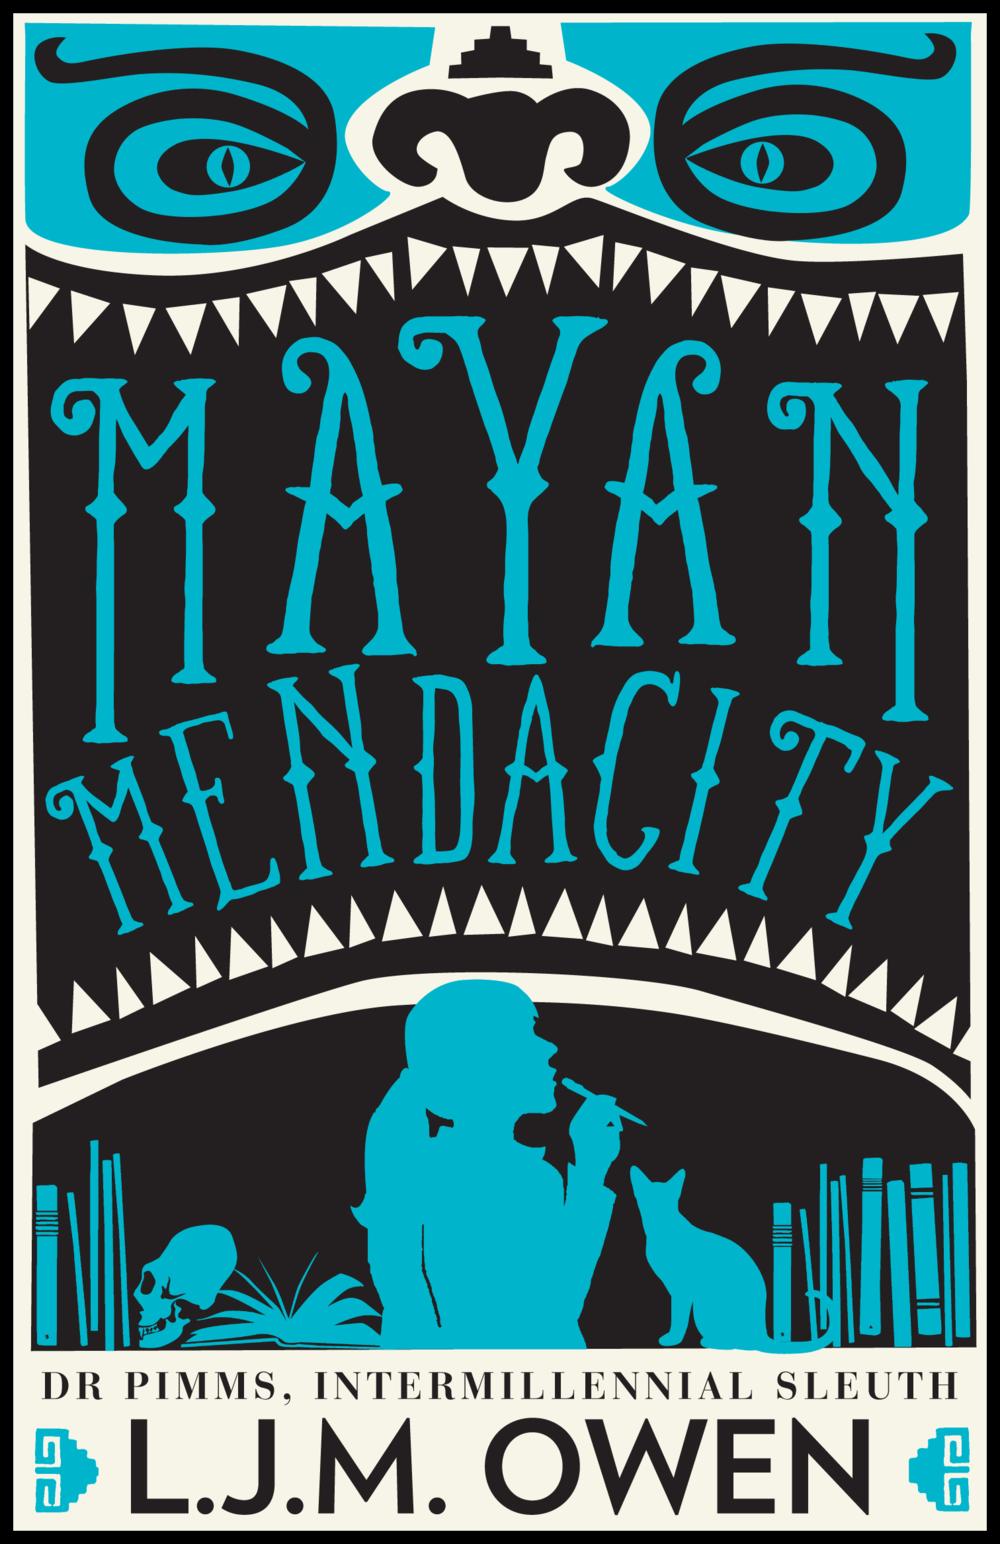 Mayan Mendacity_COVER - black border.png